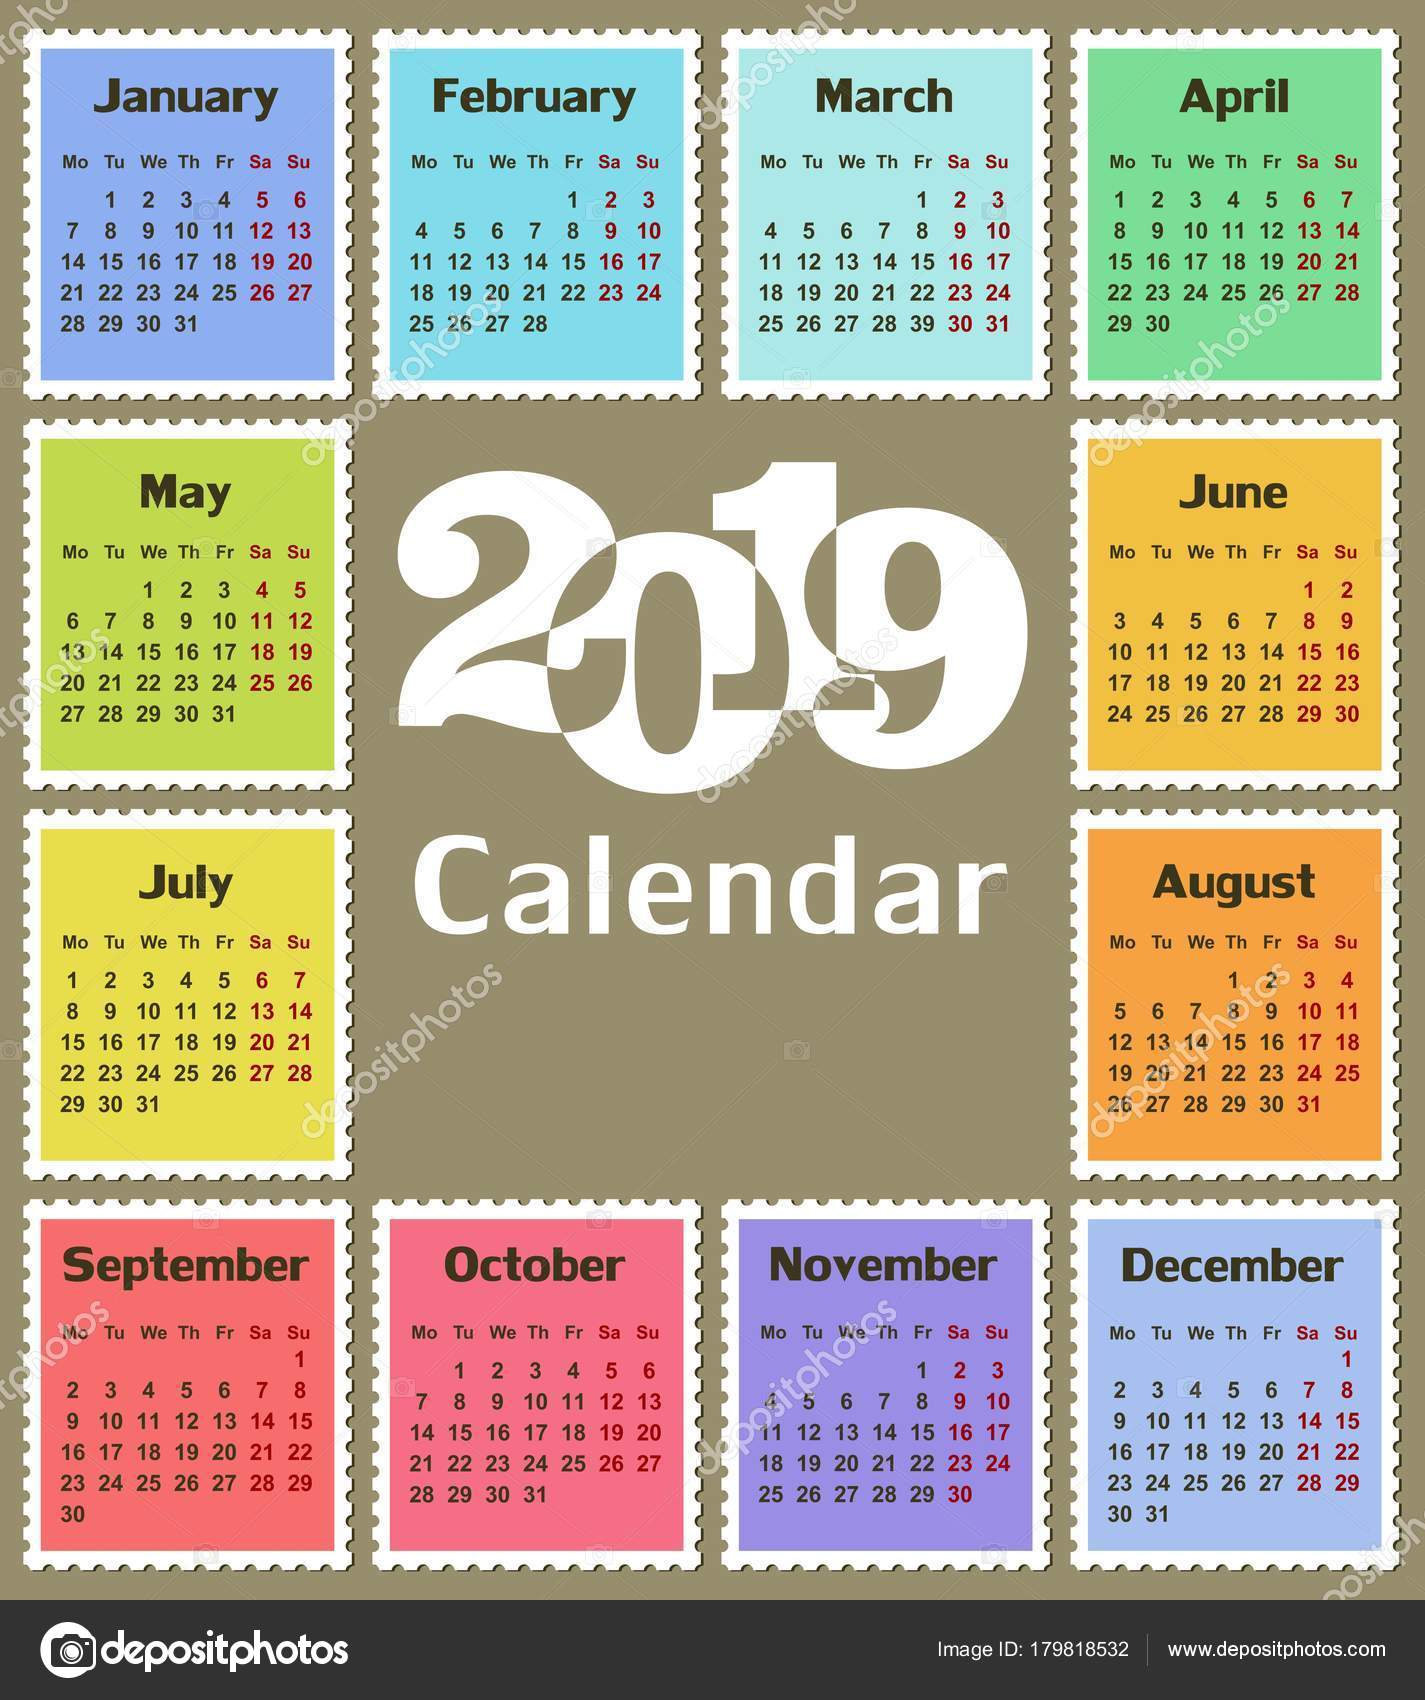 üres naptár sablon 2019 Naptár Sablon Egy Évben 2019 — Stock Vektor © Designer_an #179818532 üres naptár sablon 2019